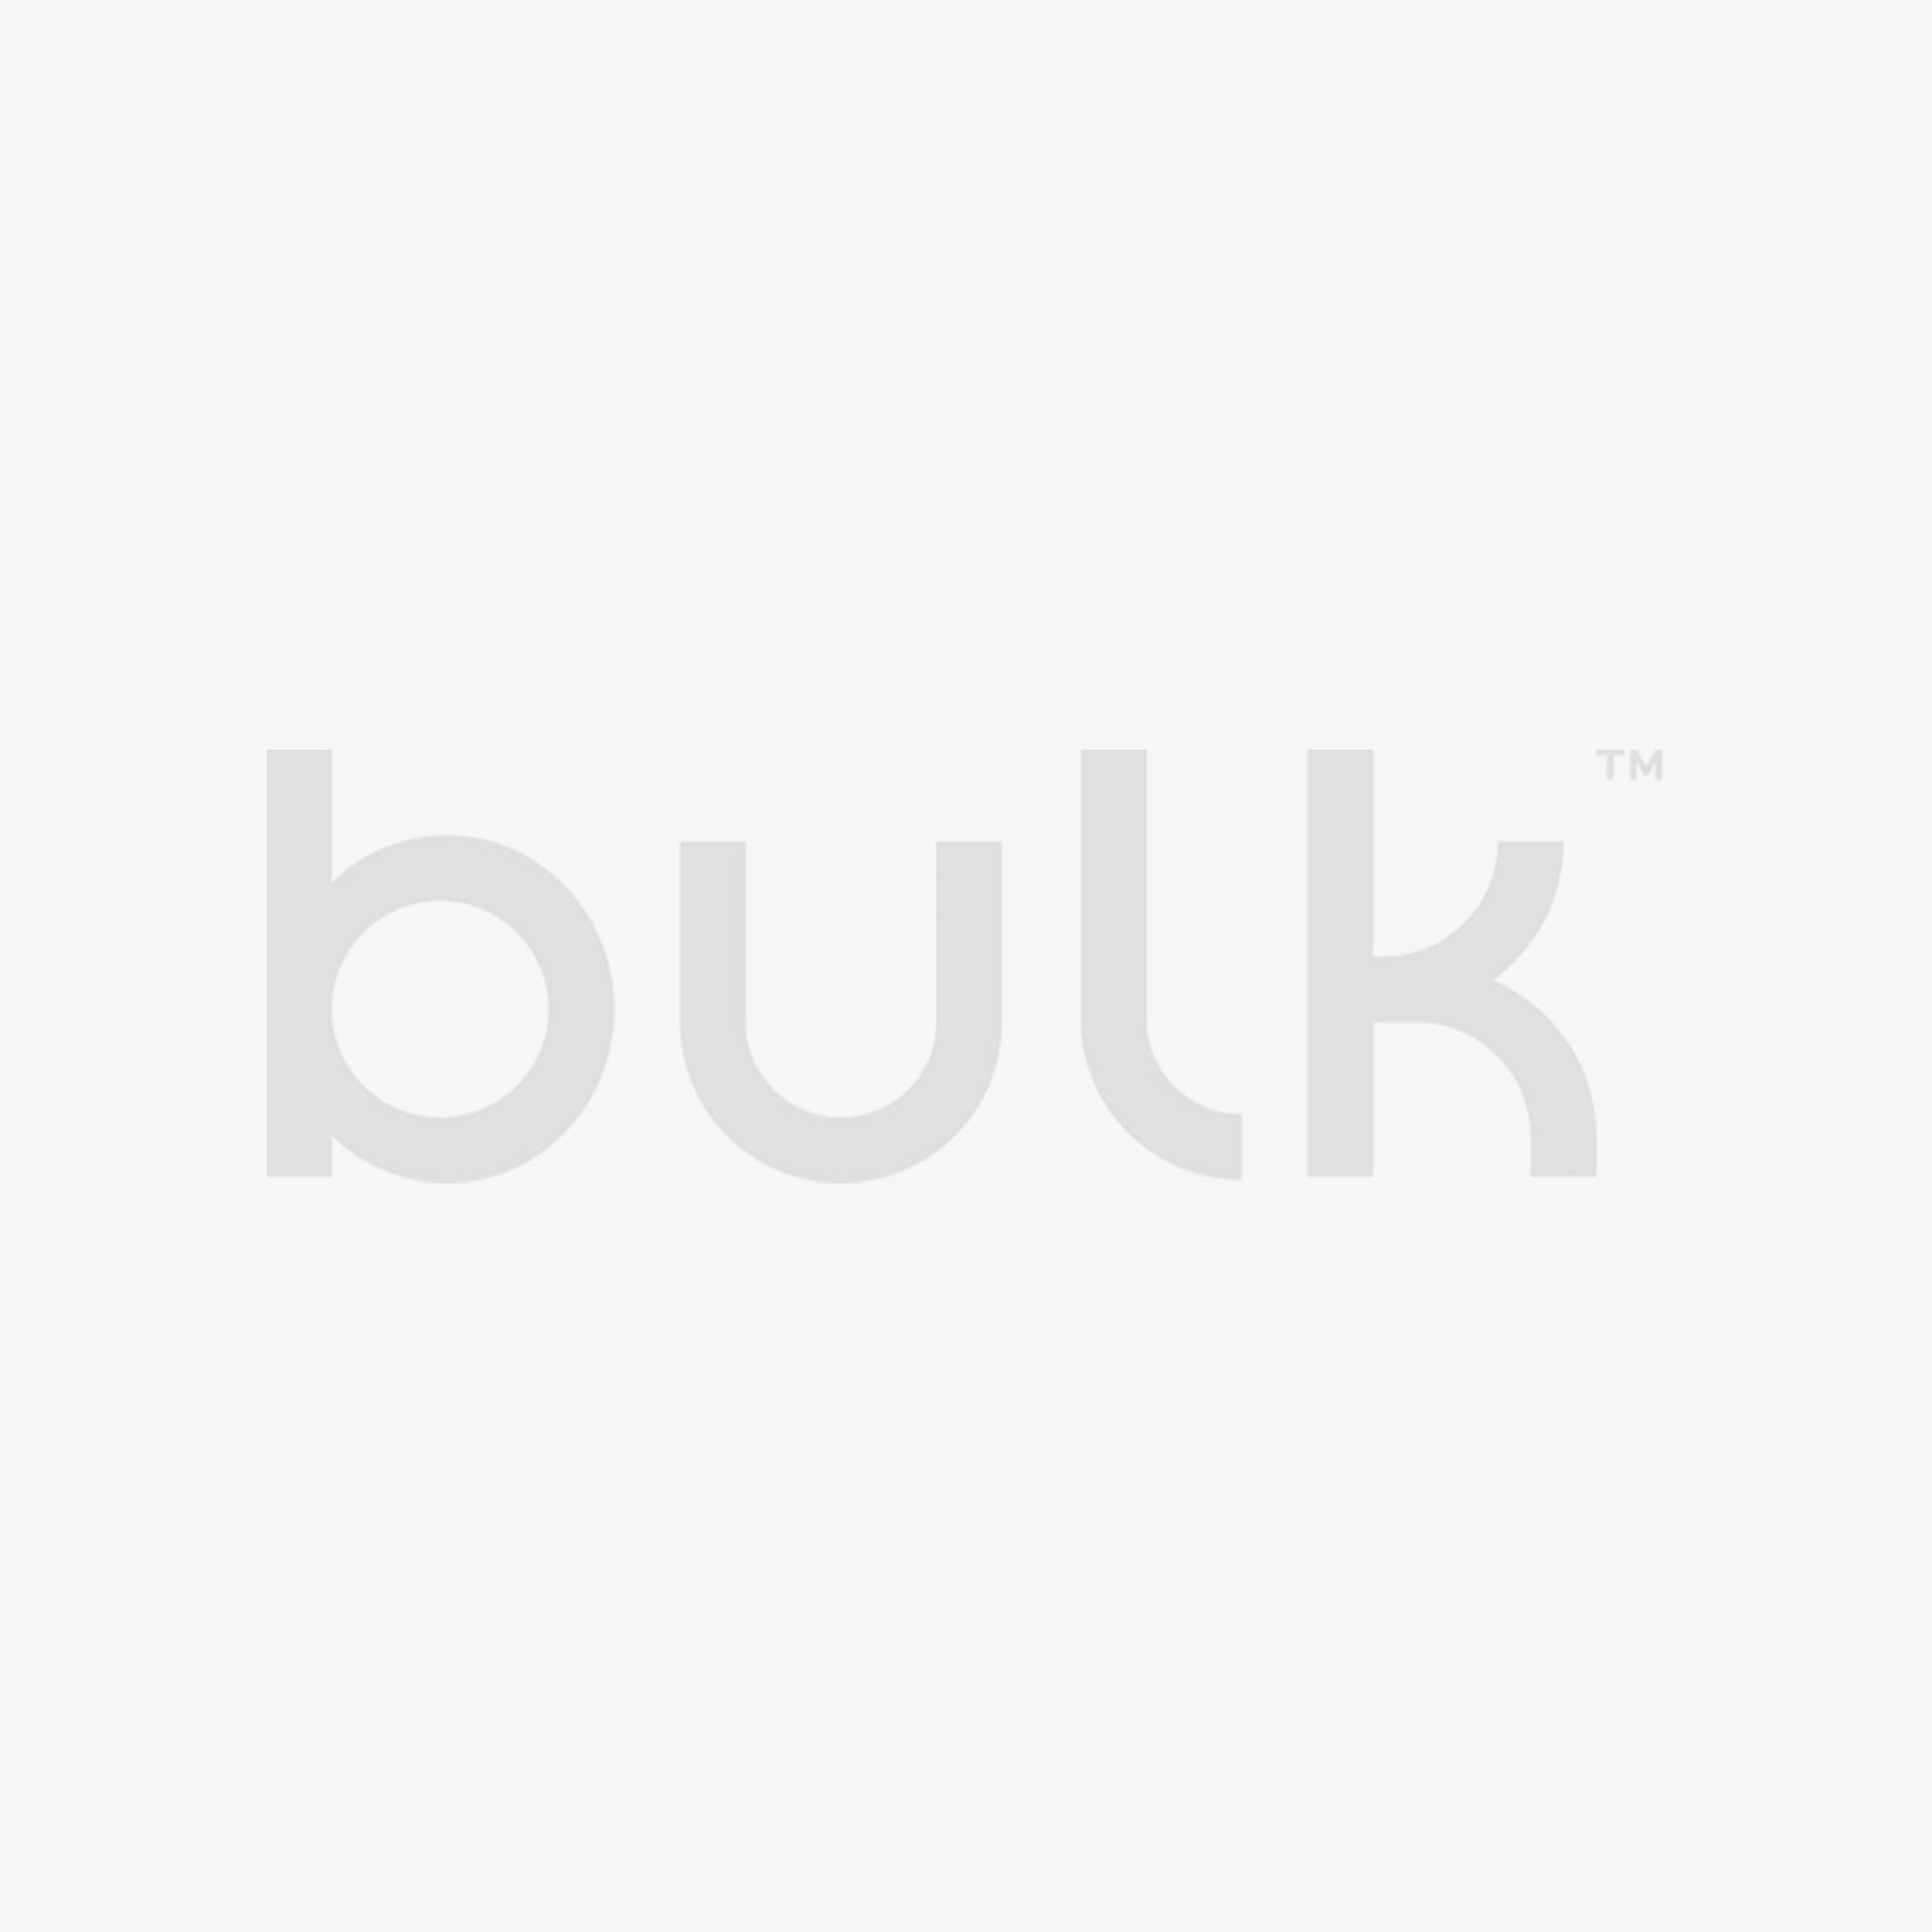 Pure Whey Protein - BULK POWDERS